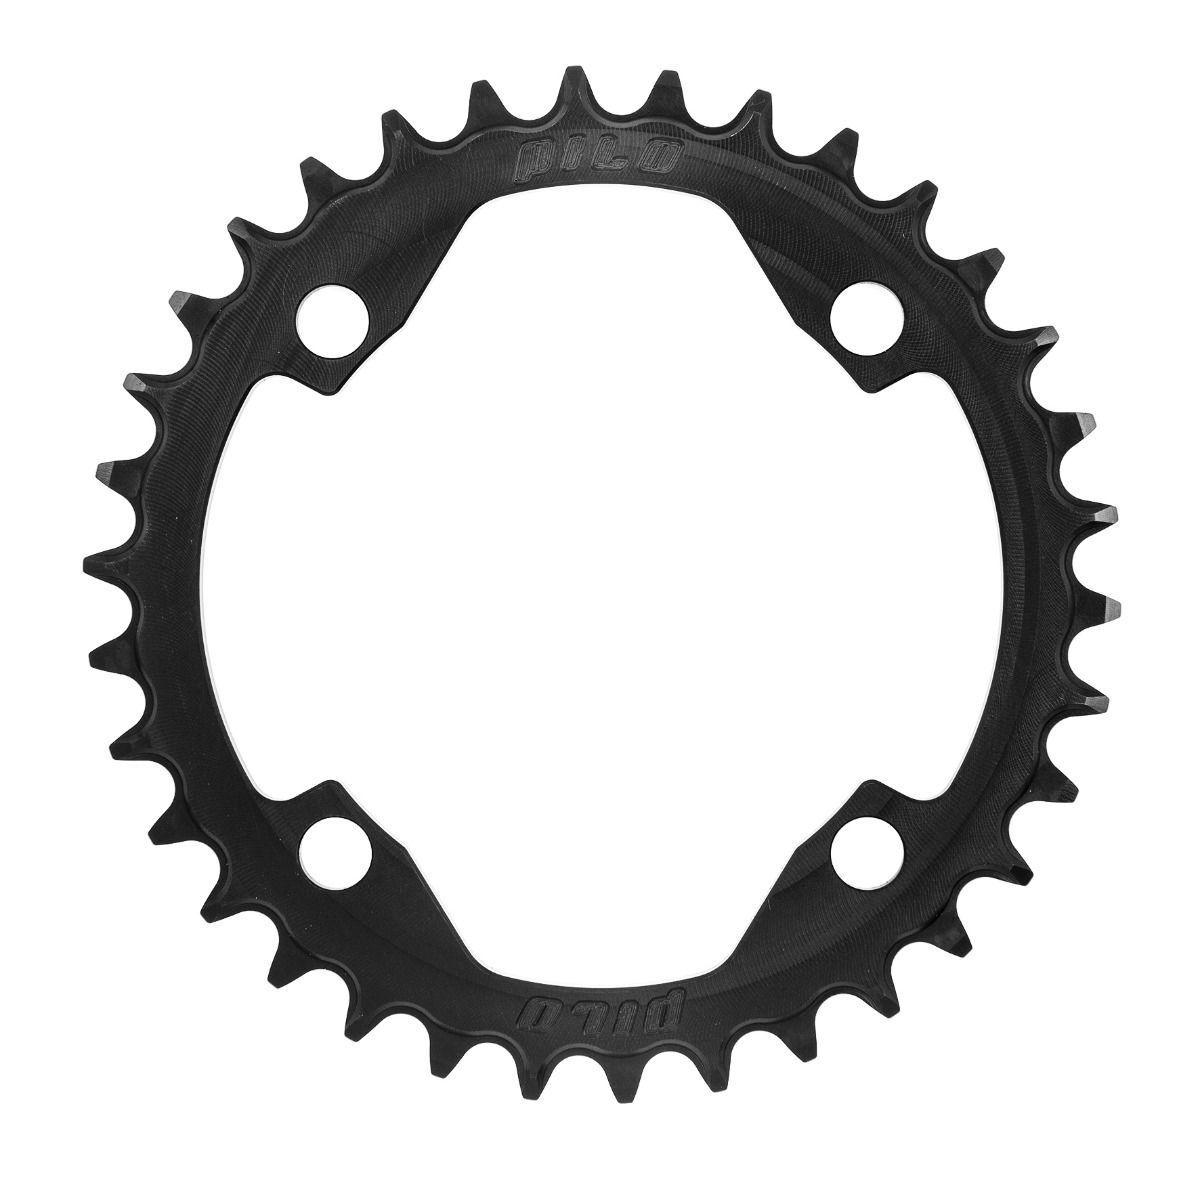 Fuji Cross #D034B Bikes 2019 Pilo D763 Derailleur Hanger for Marin